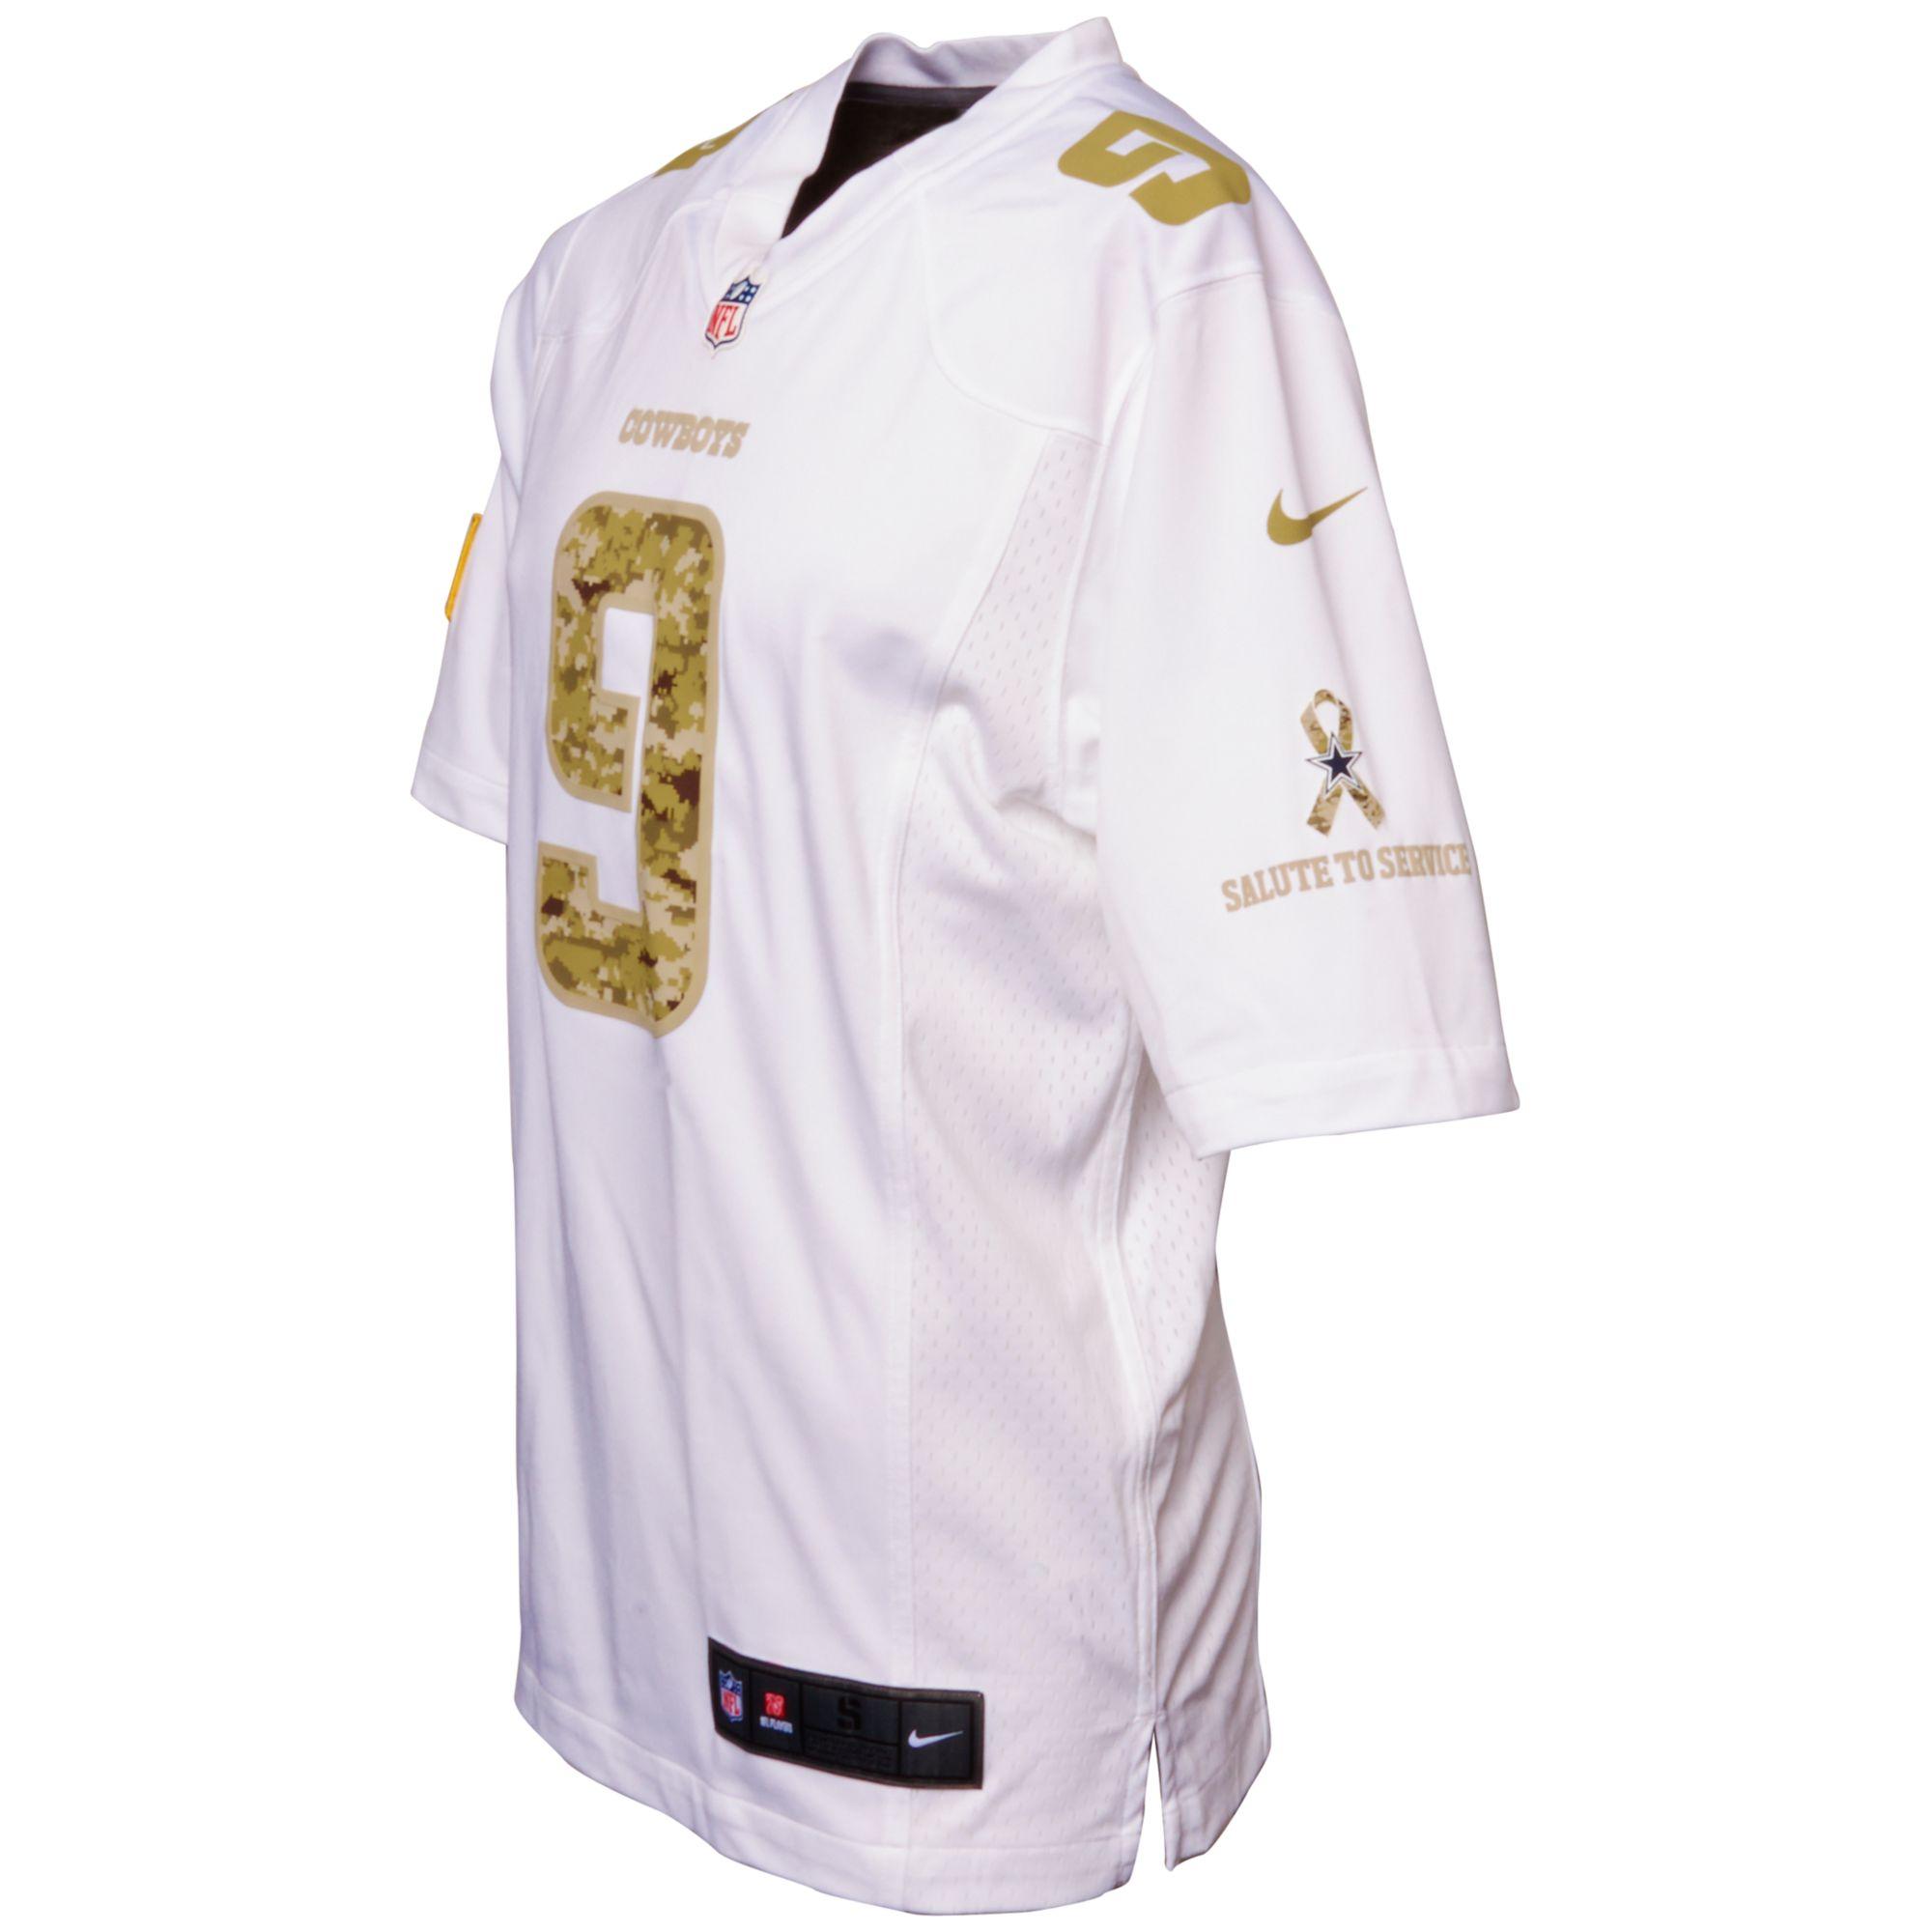 buy popular 657c0 5c7a7 Lyst - Nike Tony Romo Dallas Cowboys Jersey in White for Men